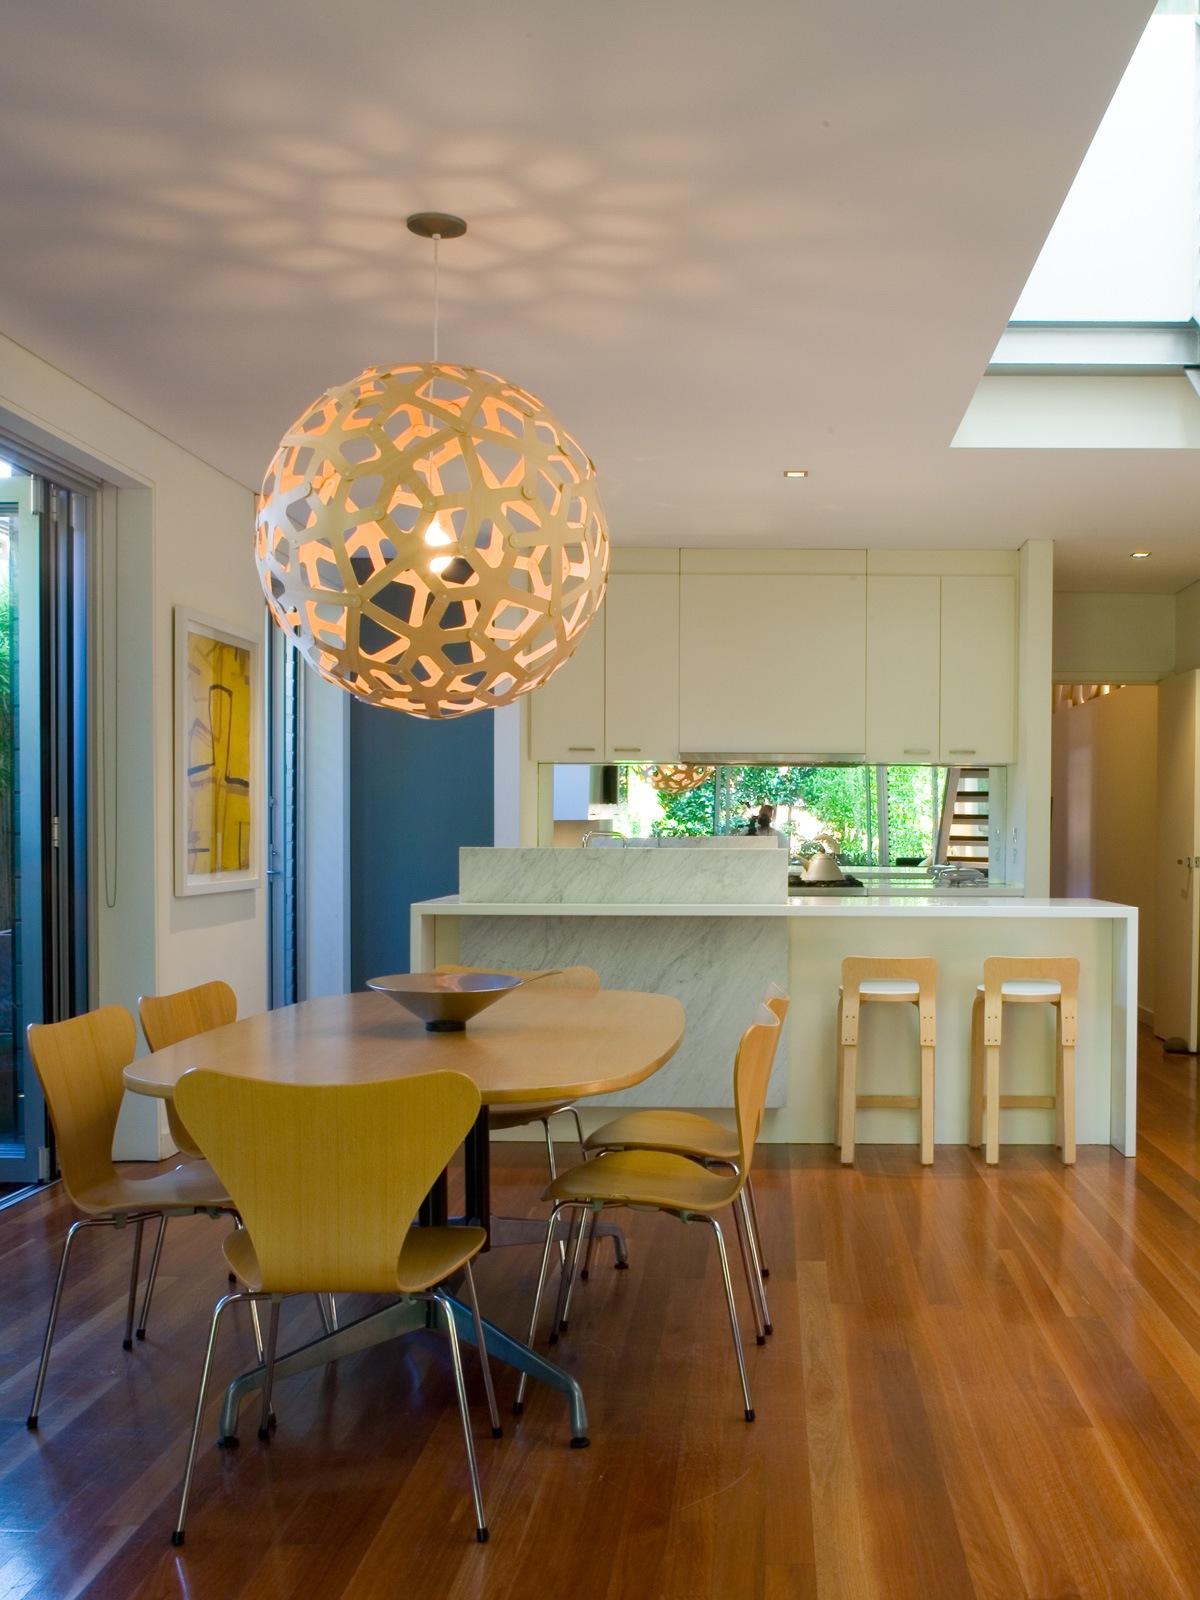 Coral Pendelleuchte David Trubridge Designort Lampen Berlin Onlineshop